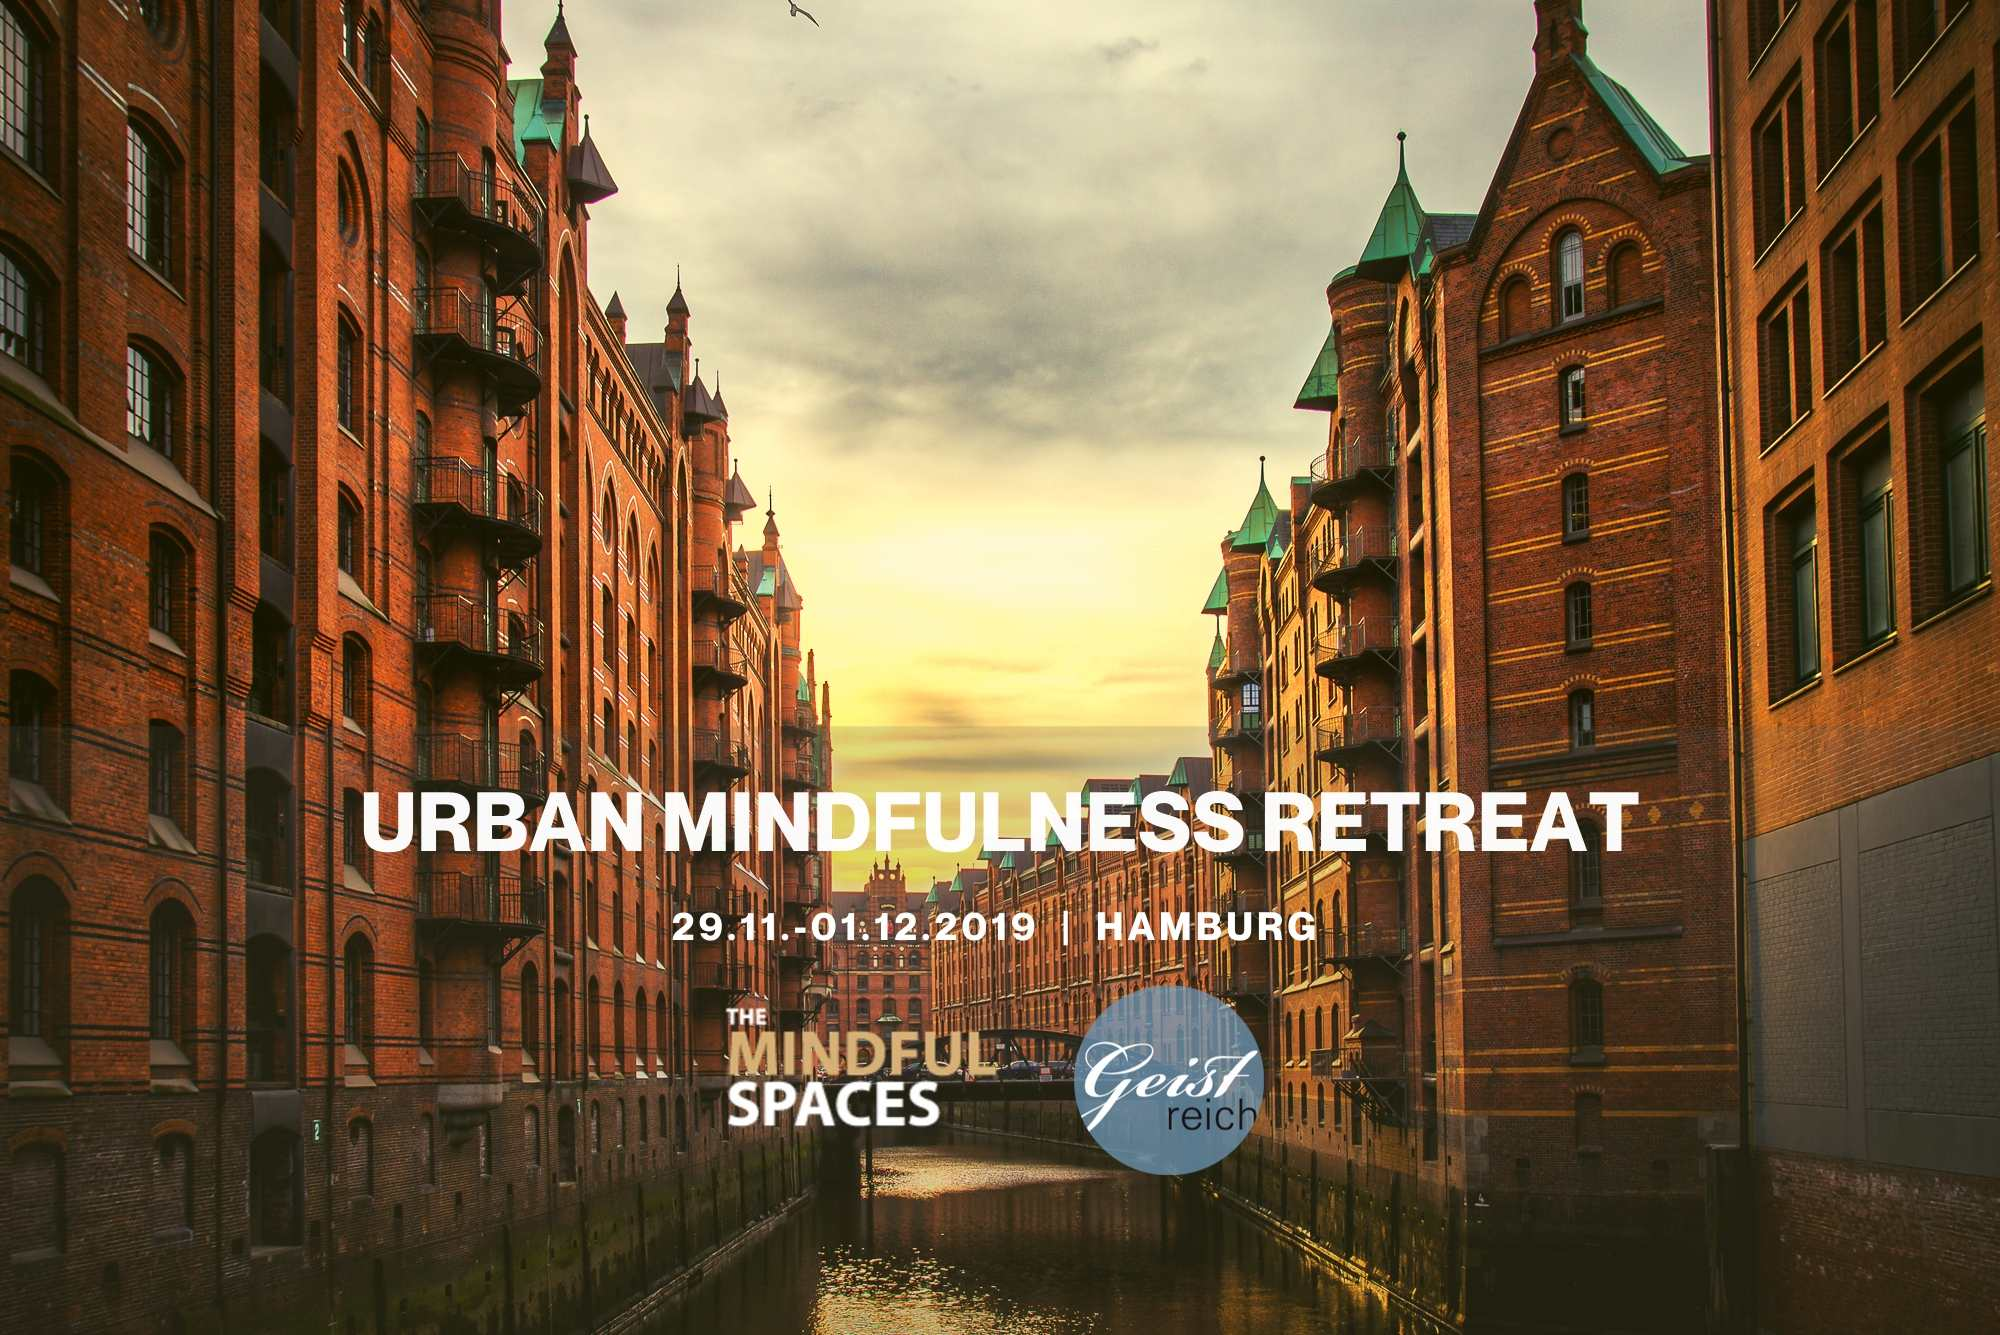 Urban Mindfulness Retreat Hamburg